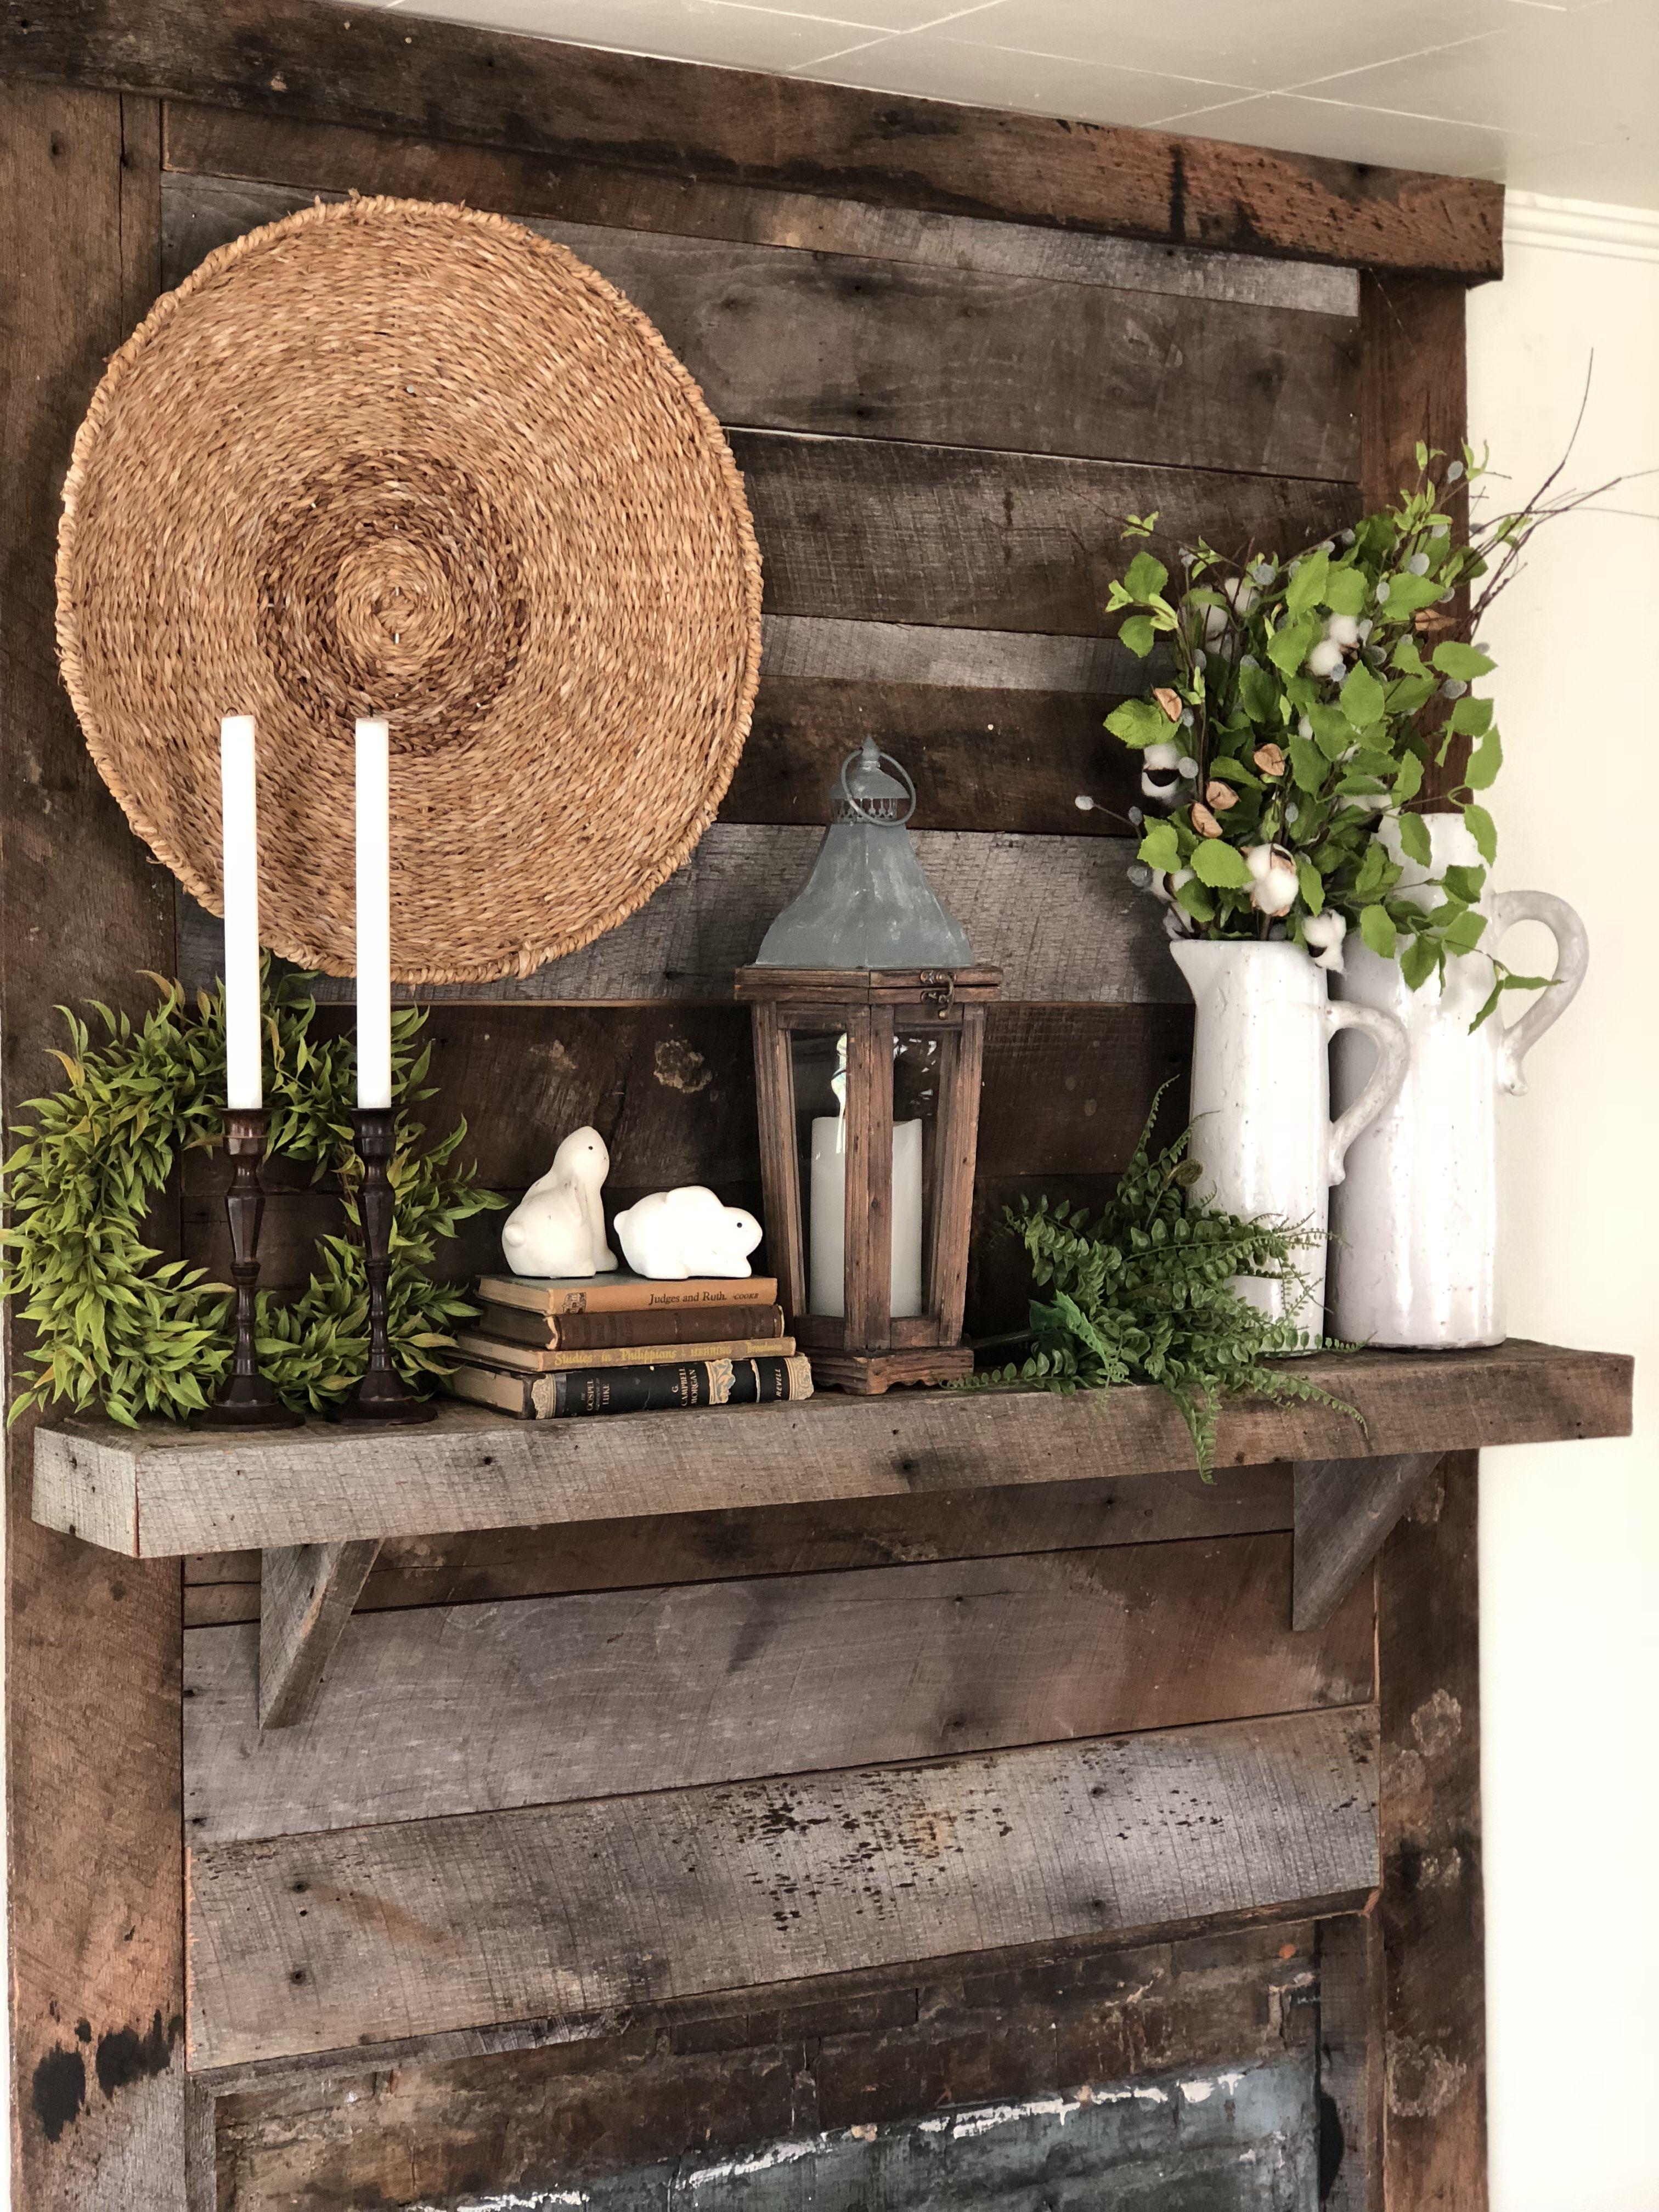 Rustic farmhouse mantel spring mantel decor barn wood fireplace